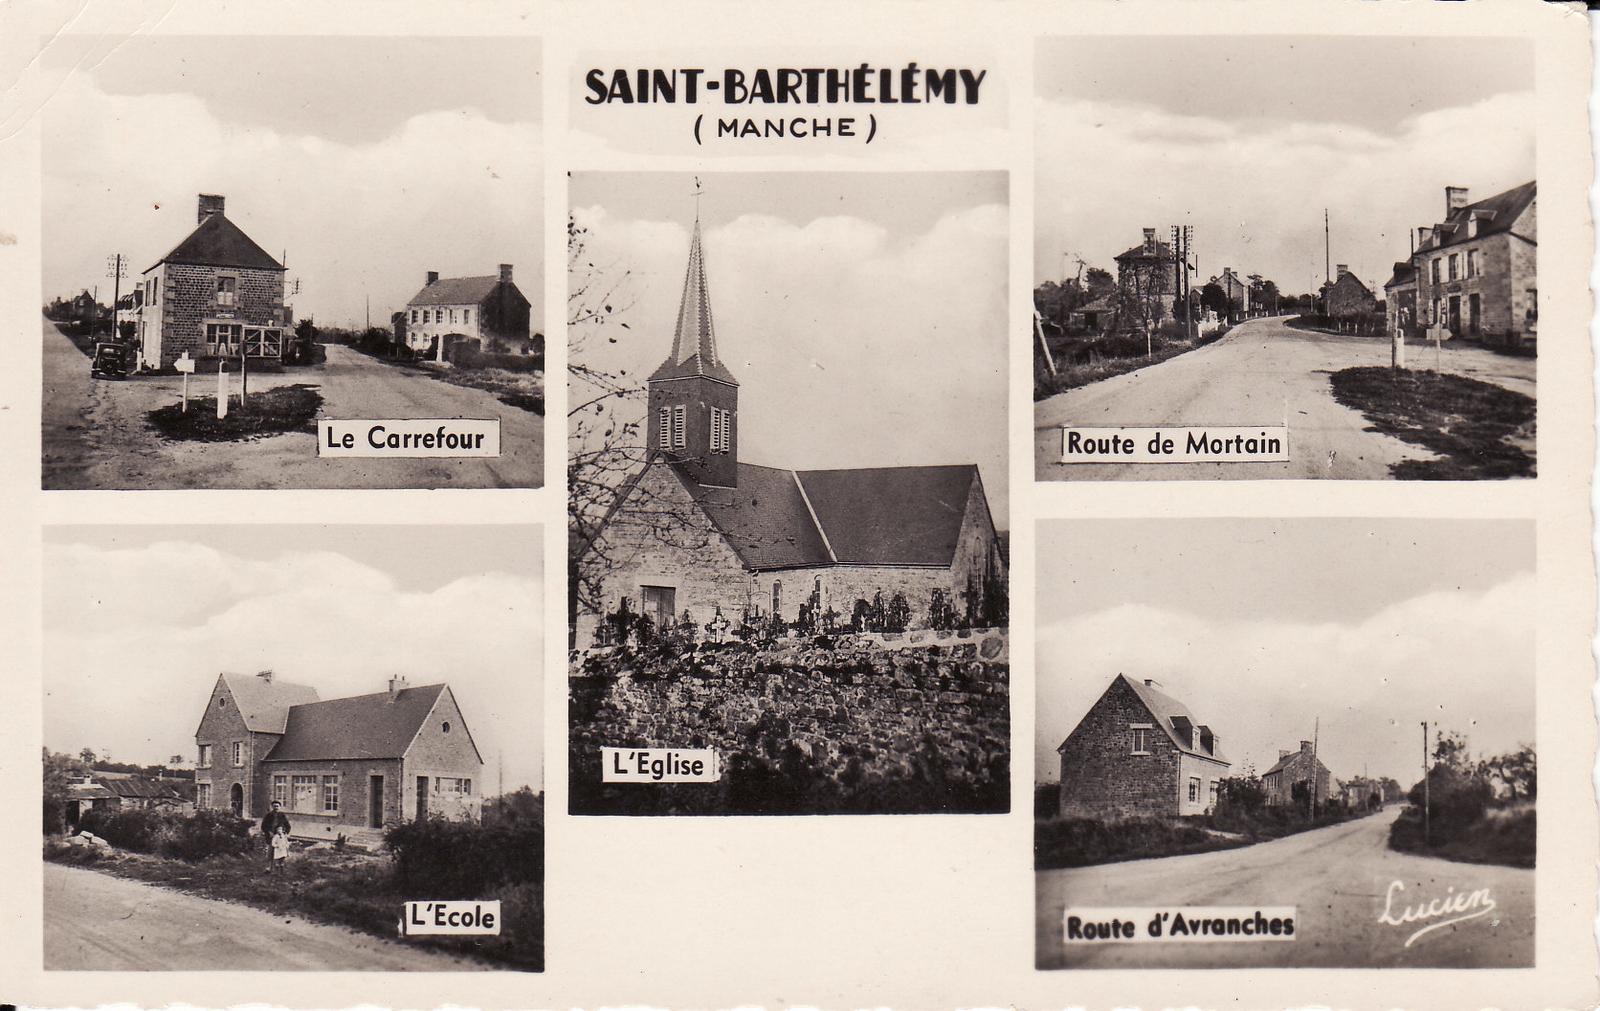 https://dwpt1kkww6vki.cloudfront.net/img/carte-postale/carte-postale-saint-barthelemy-90944.jpg